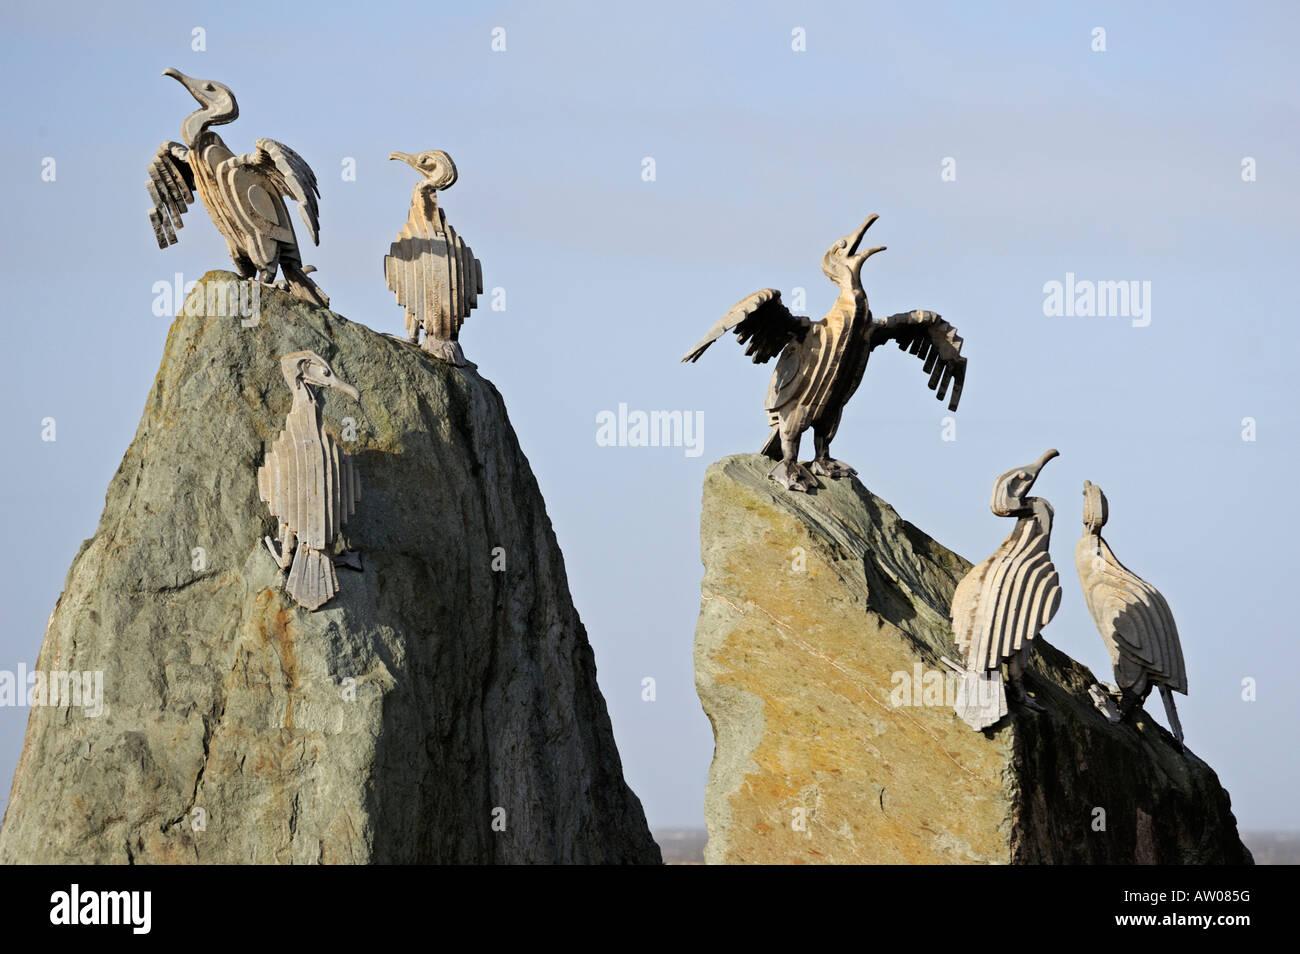 Cormorant bird sculpture. The Tern Project. Morecambe, Lancashire, England, United Kingdom, Europe. - Stock Image